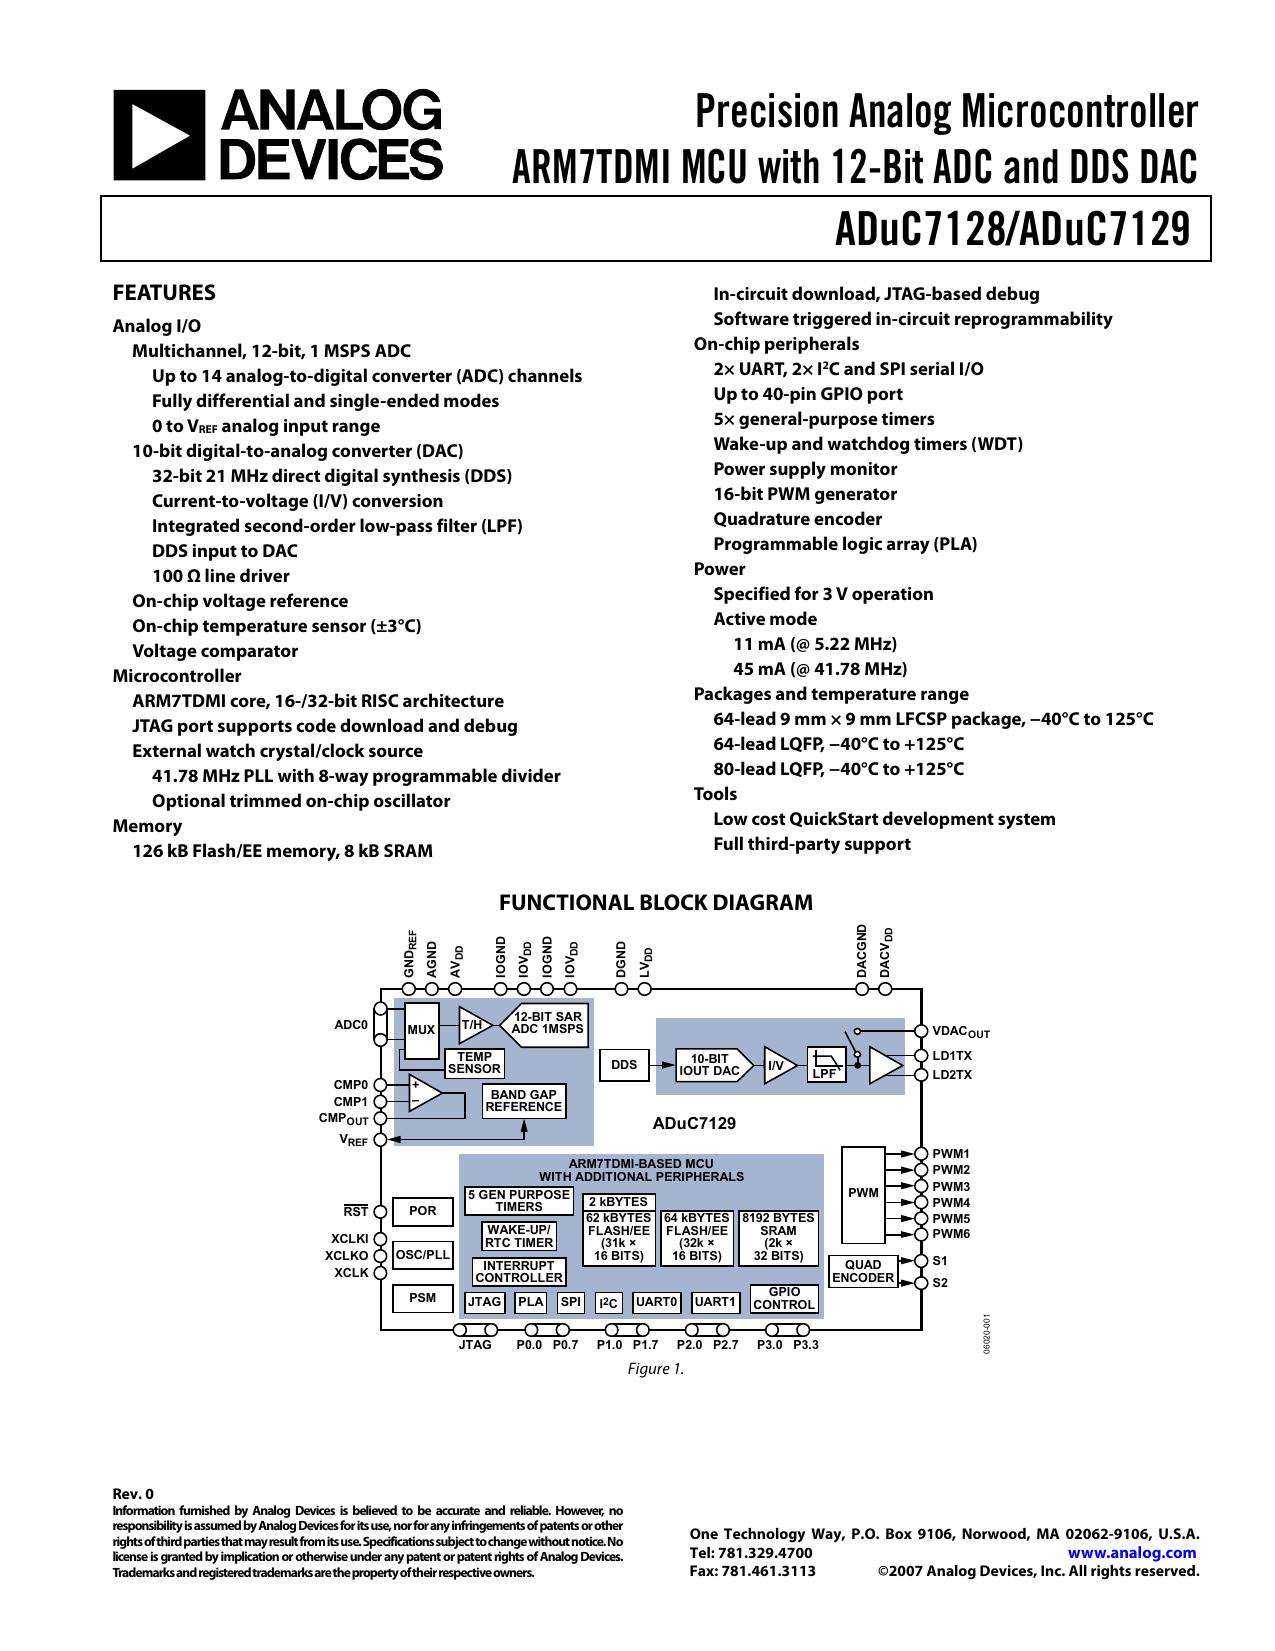 Precision Analog Microcontroller ARM7TDMI MCU with 12-Bit